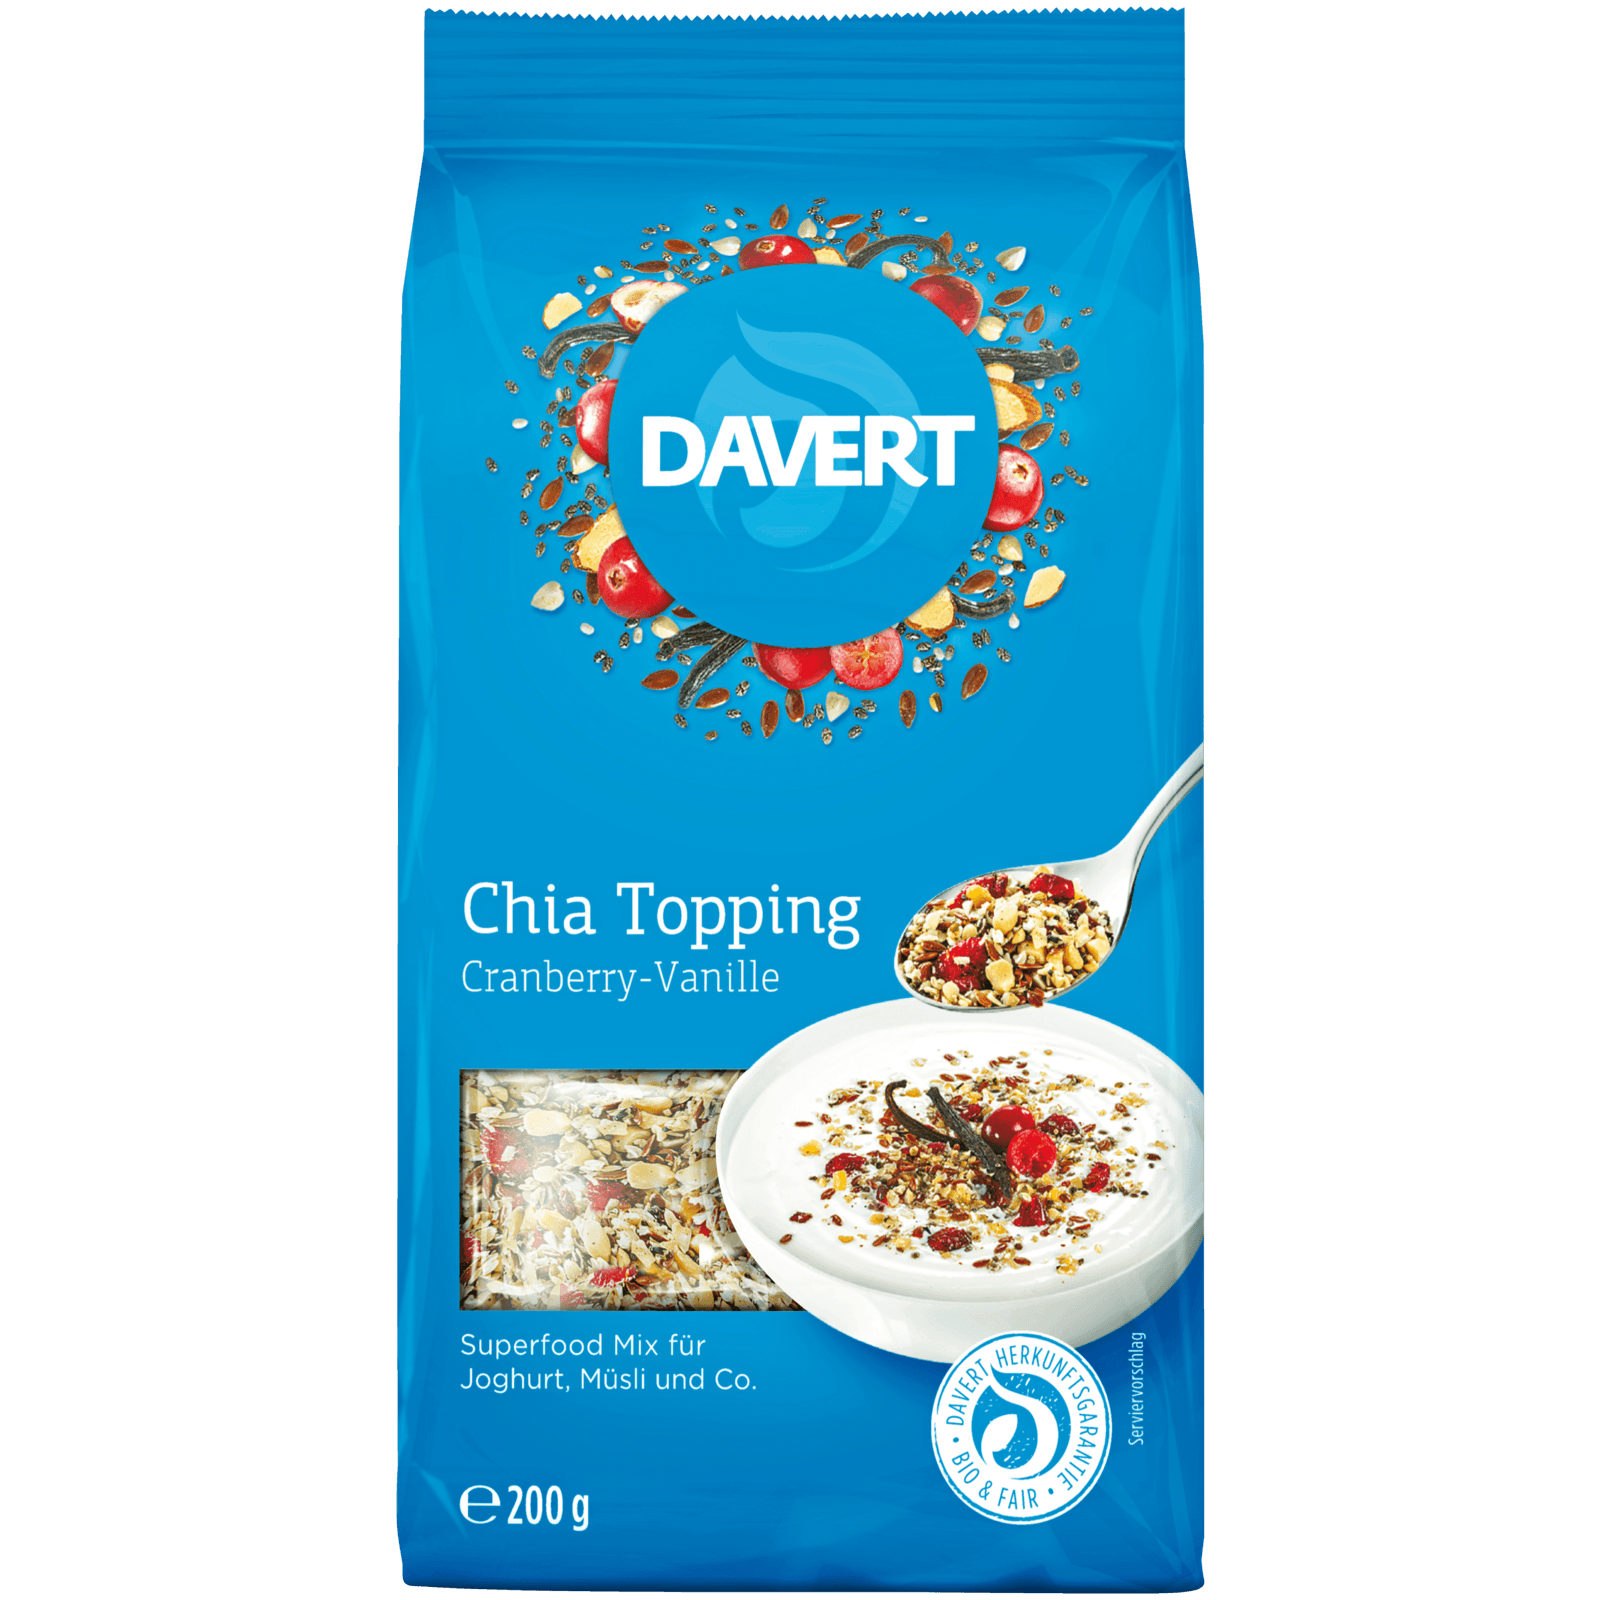 Davert Chia Topping Cranberry-Vanille 200g